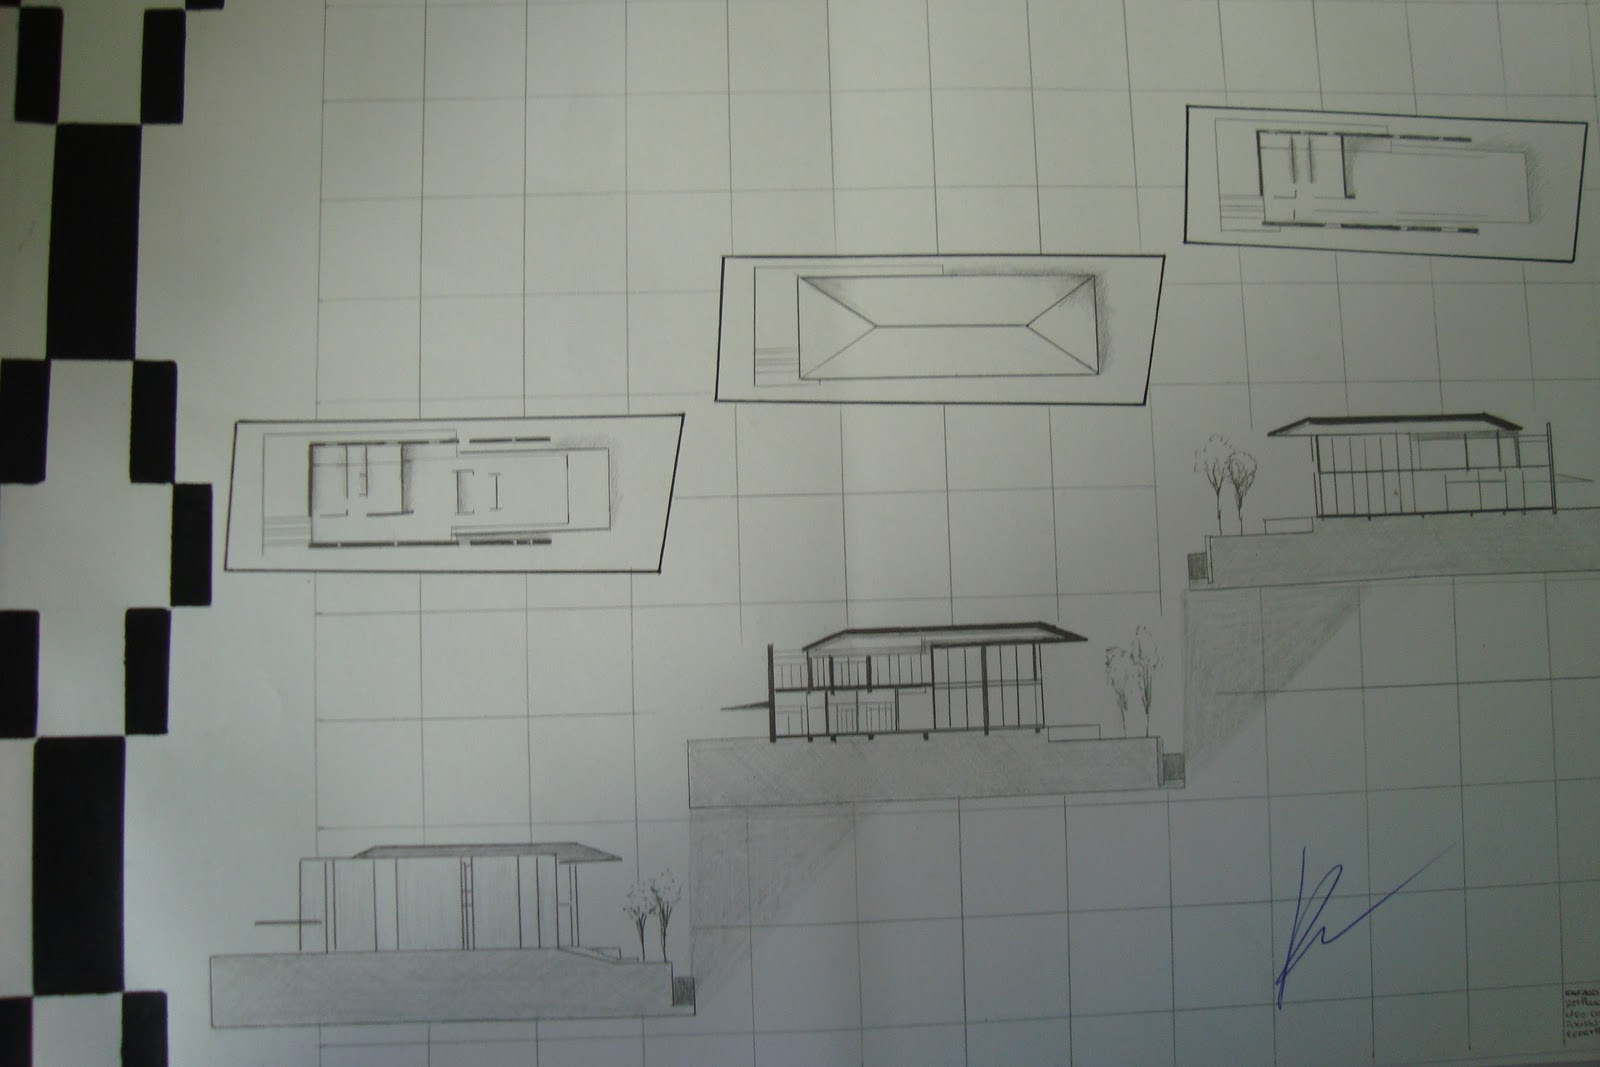 La eskina norte de arquitectura laminas de presentacion for Laminas arquitectura